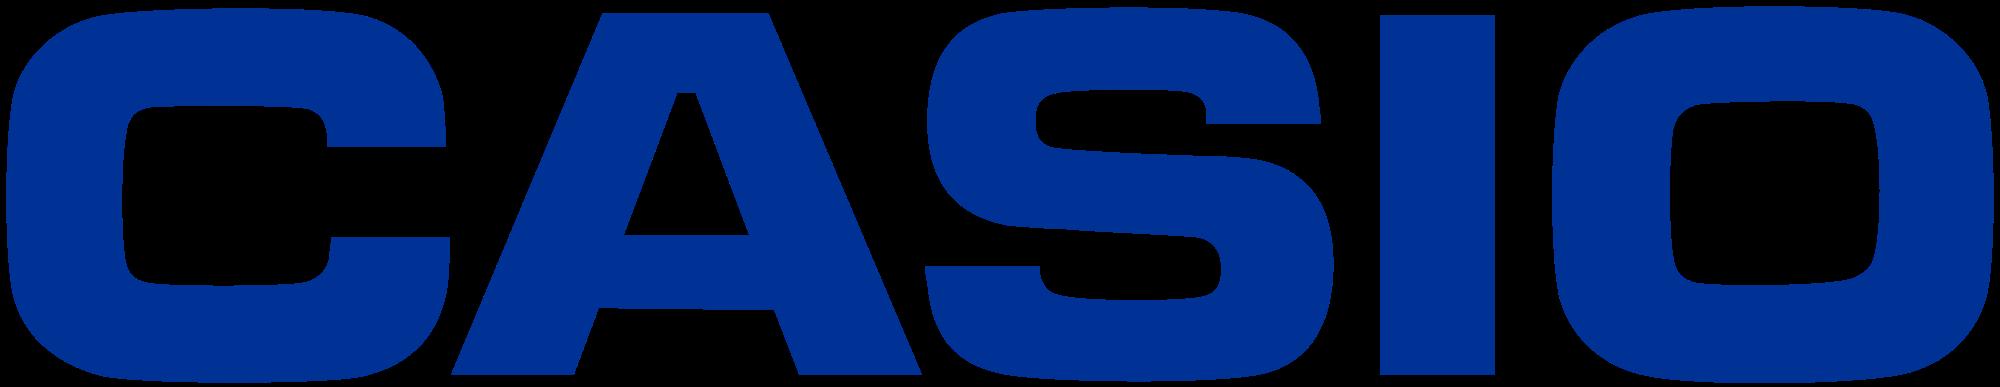 Casio_logo (1).png